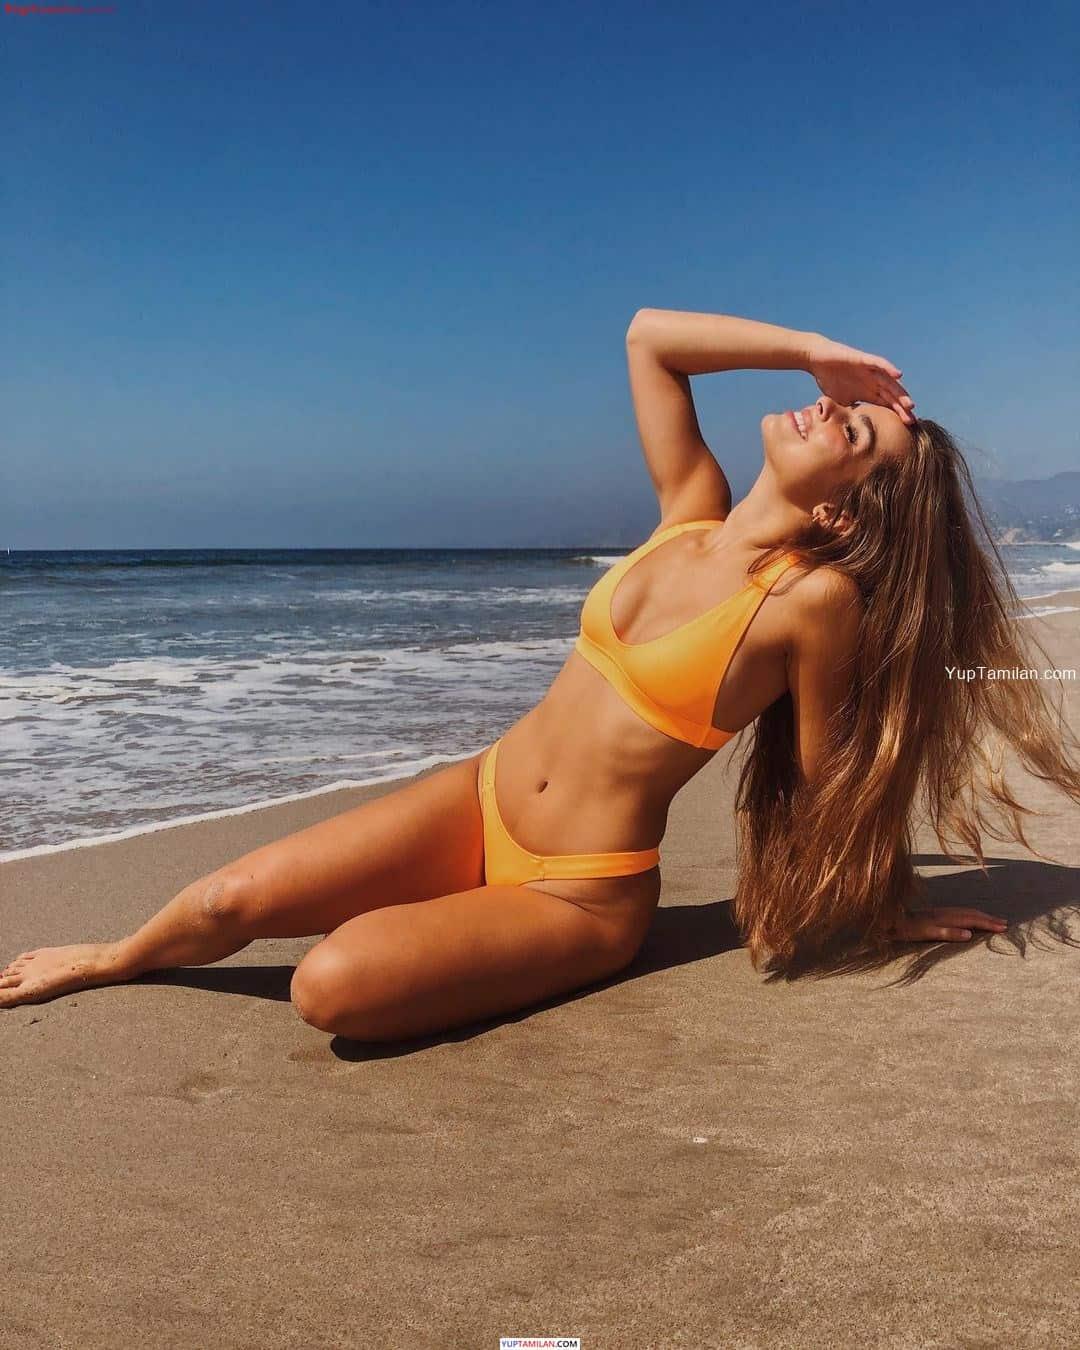 Addison Rae Sexy Bikini Photos- Hot Lingerie Image & Swimsuit Pics